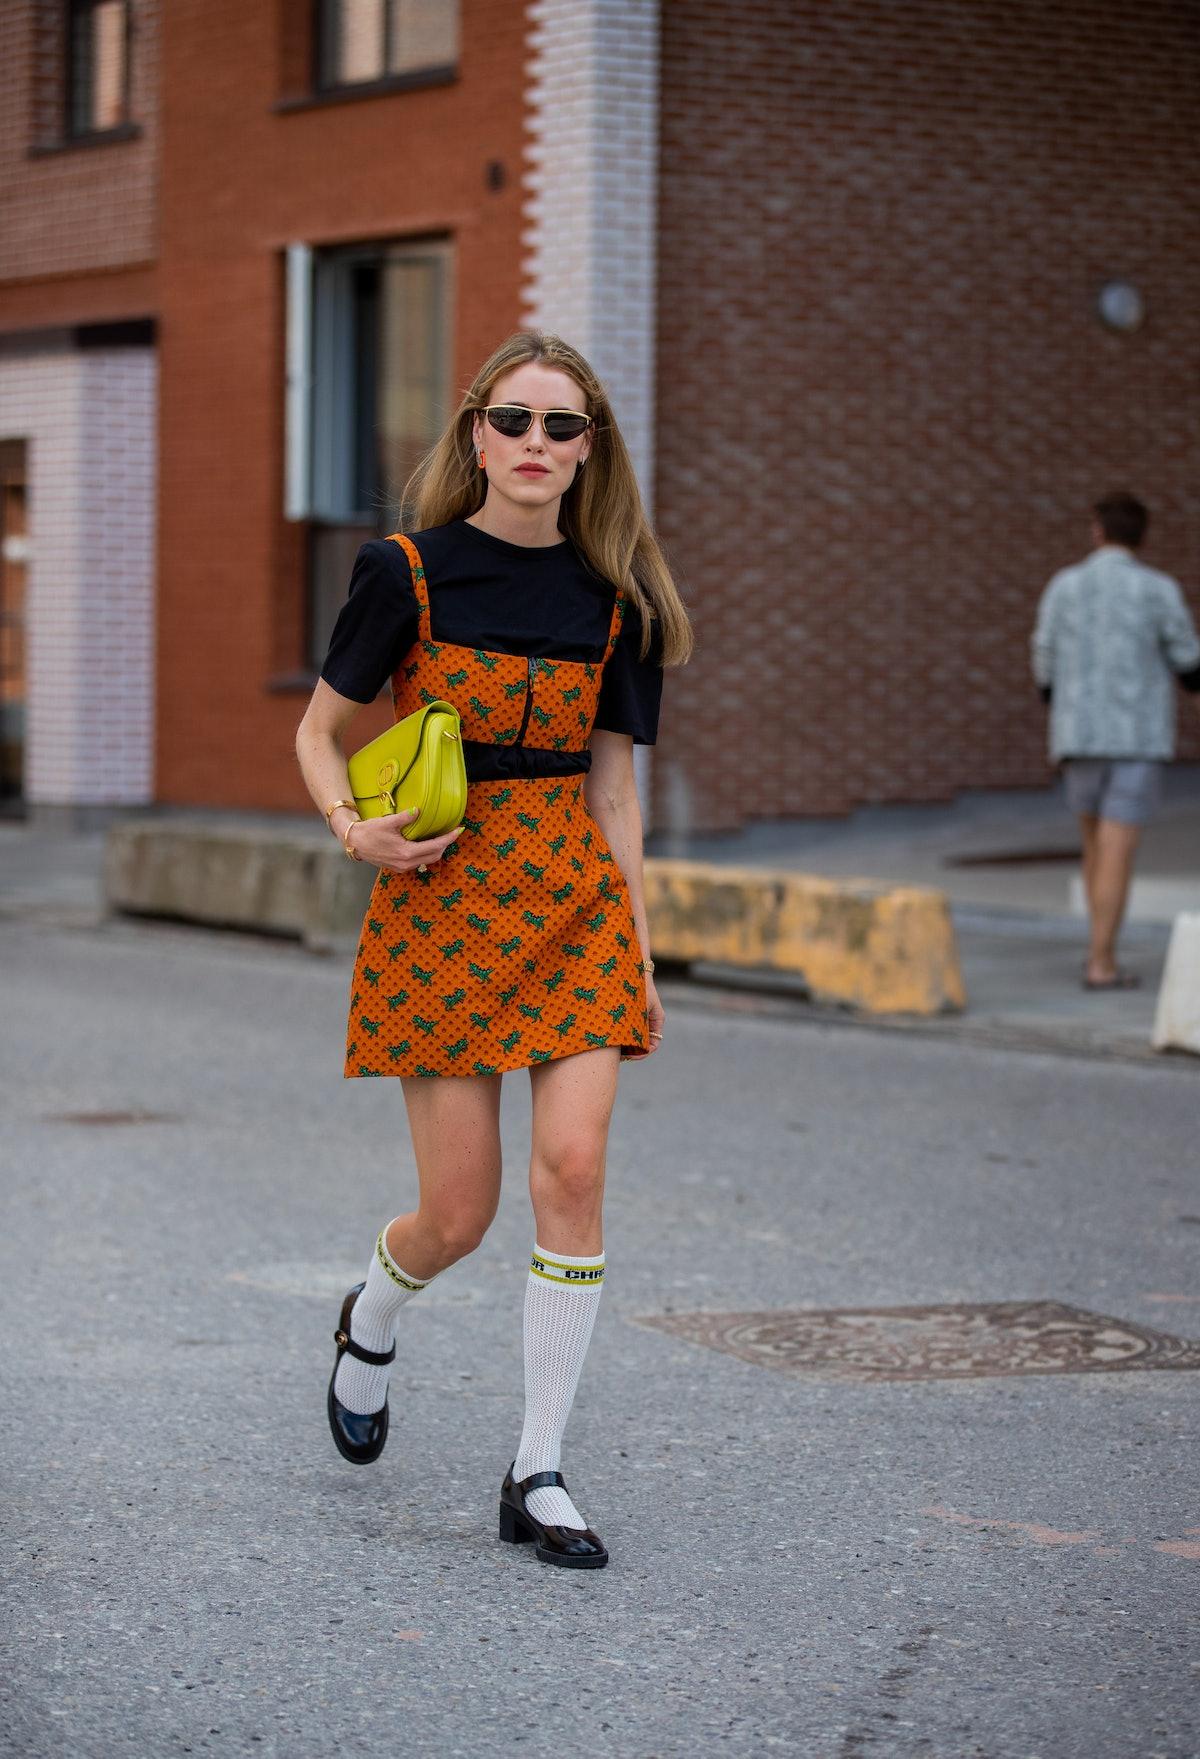 Annabel Rosendahl seen wearing orange dress with print, neon bag, knee socks and shoes outside Desig...